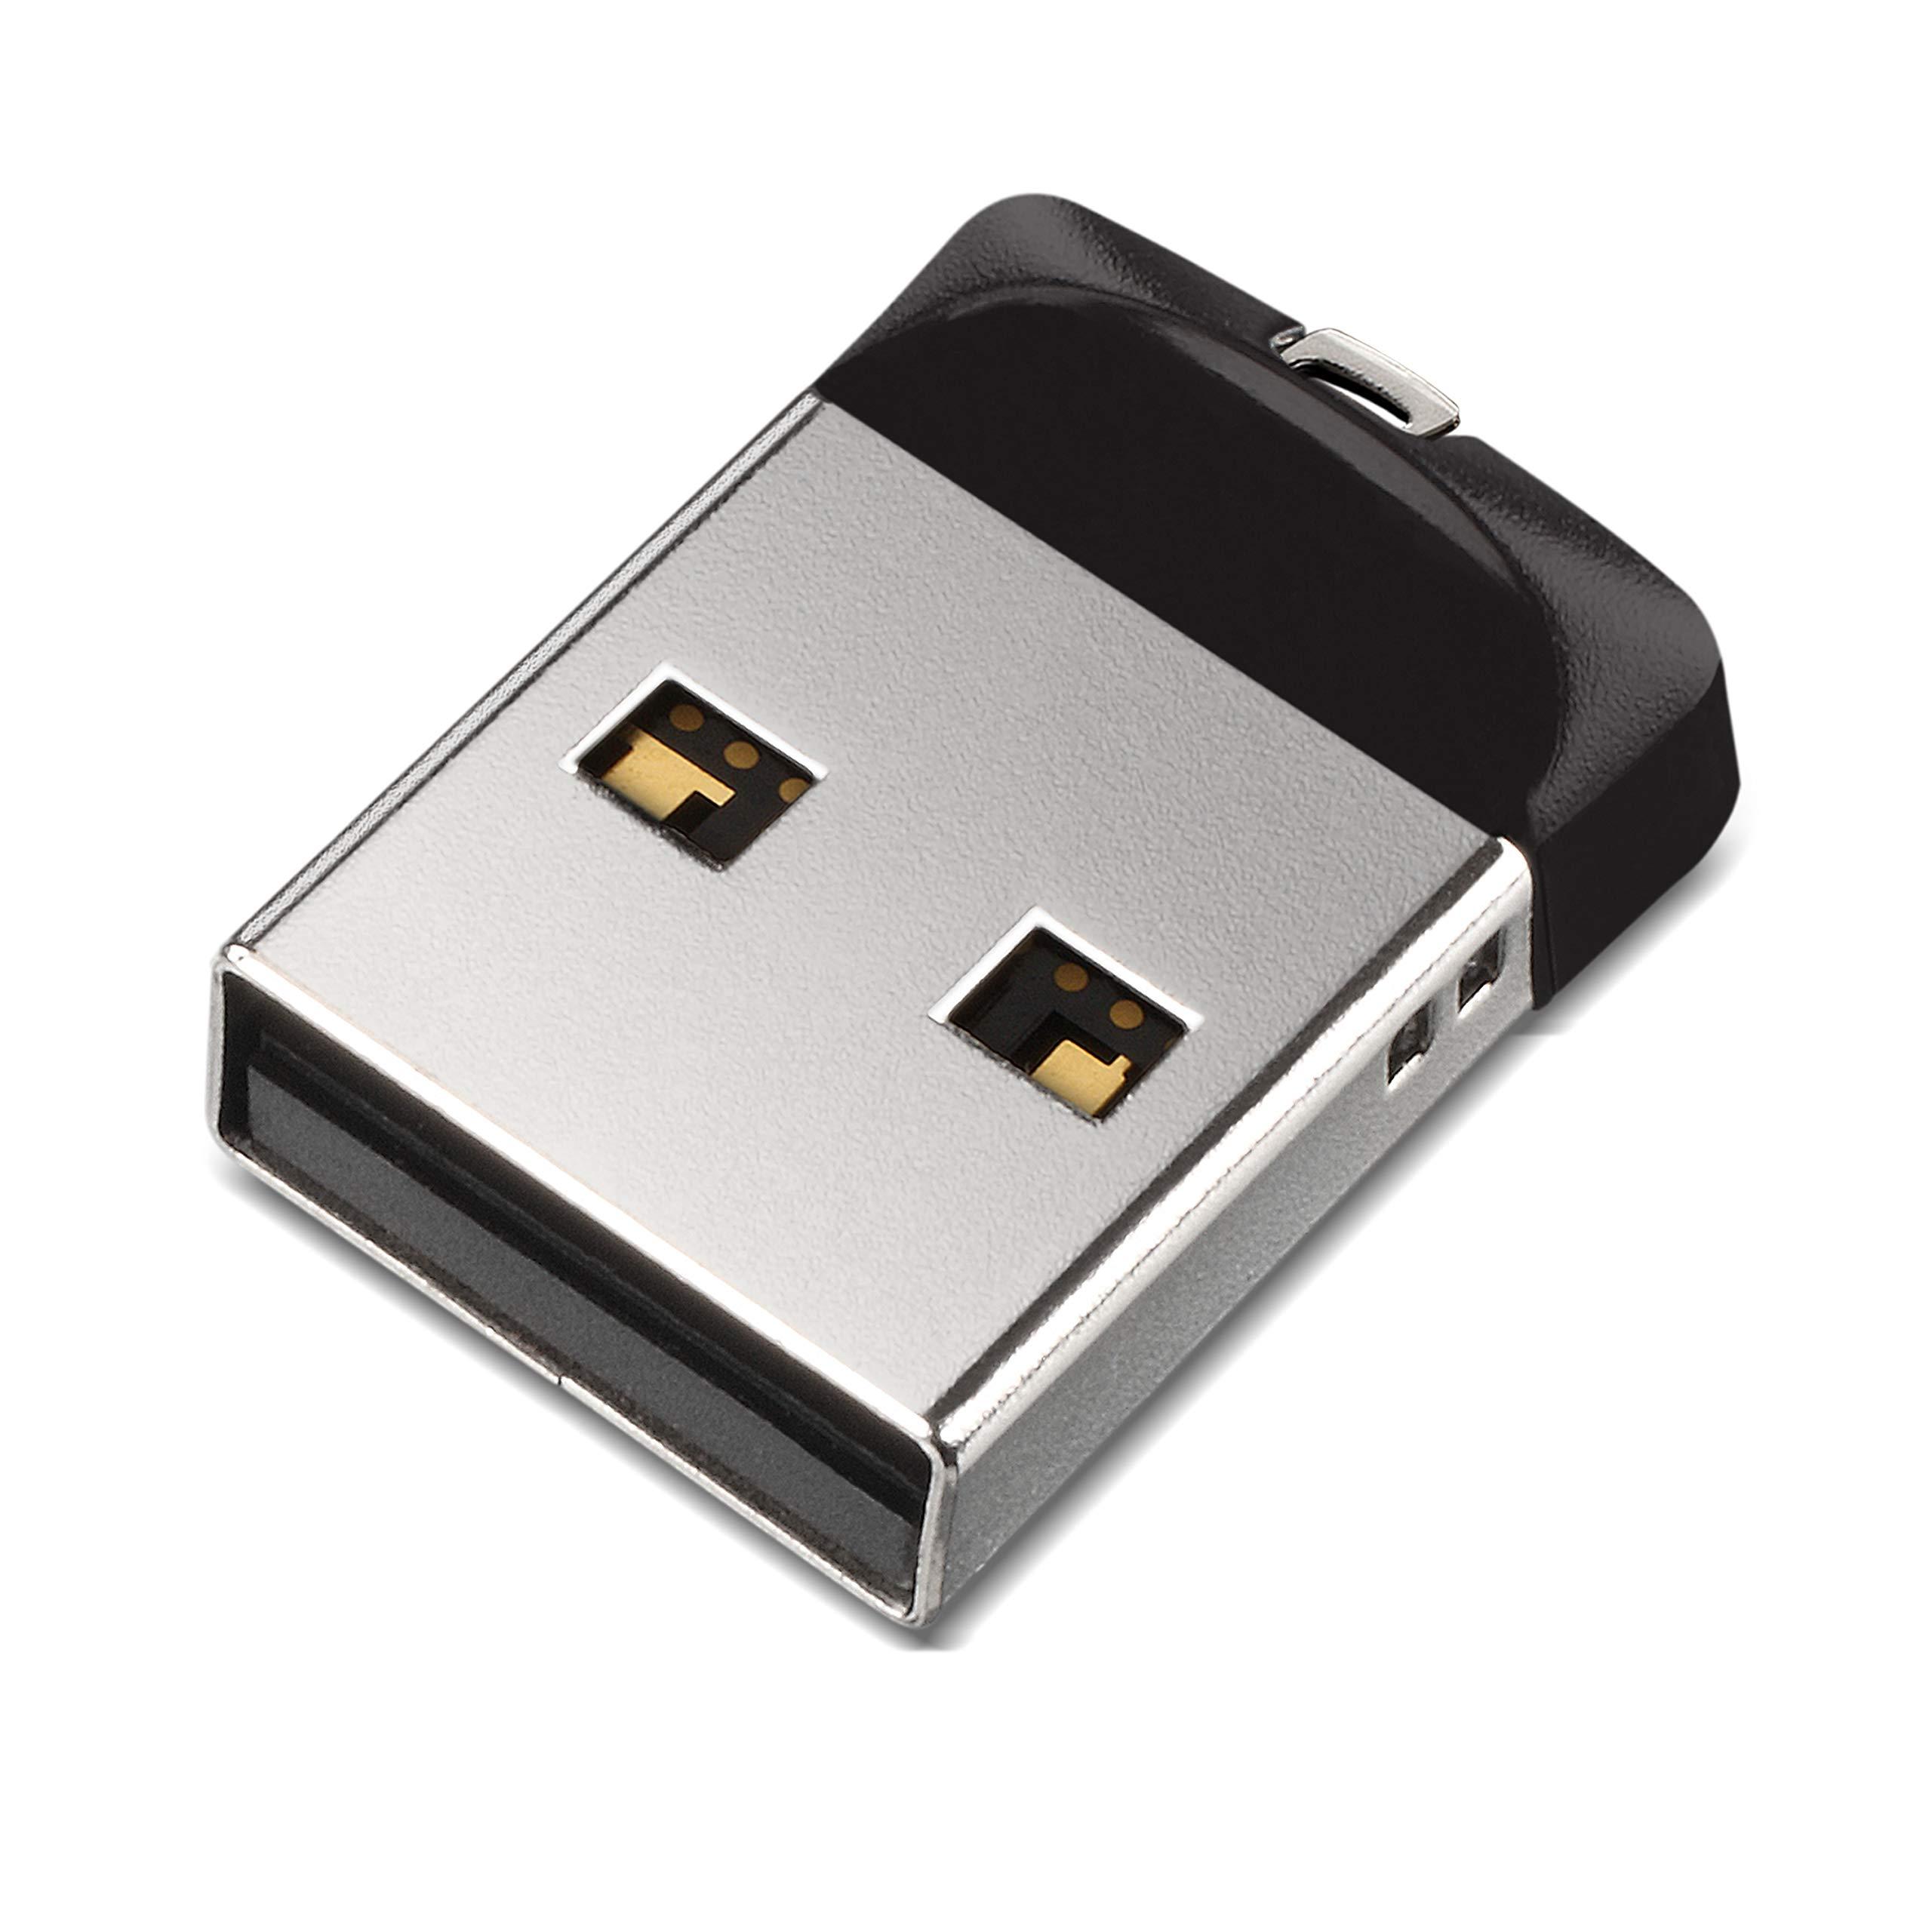 SanDisk 64GB Cruzer Fit USB Flash Drive - SDCZ33-064G-G35 by SanDisk (Image #2)